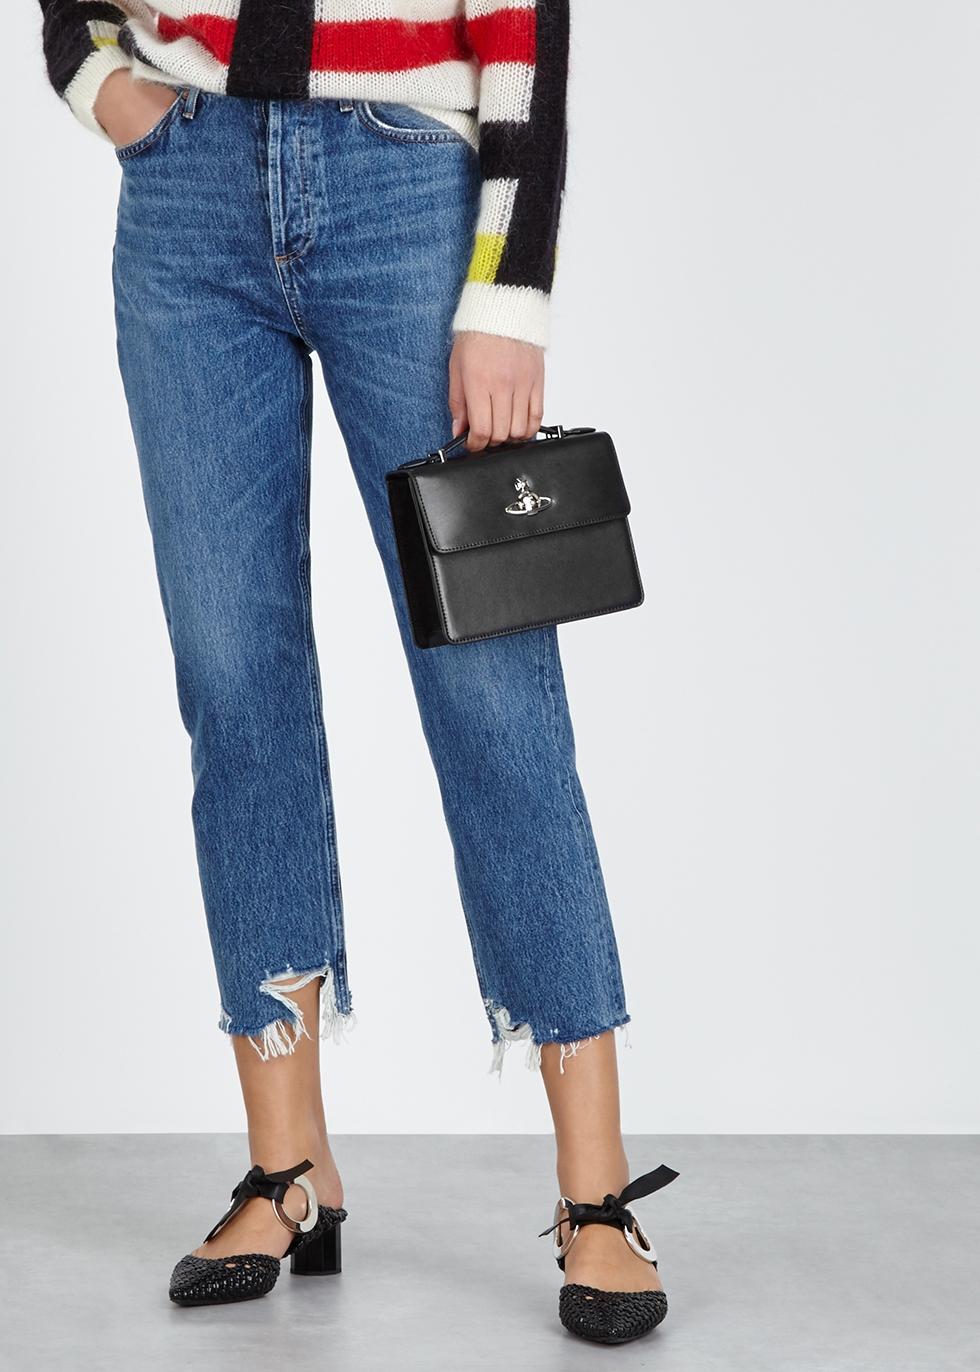 Vivienne Westwood Matilda medium leather shoulder bag - Harvey Nichols 7bb336d0b93aa